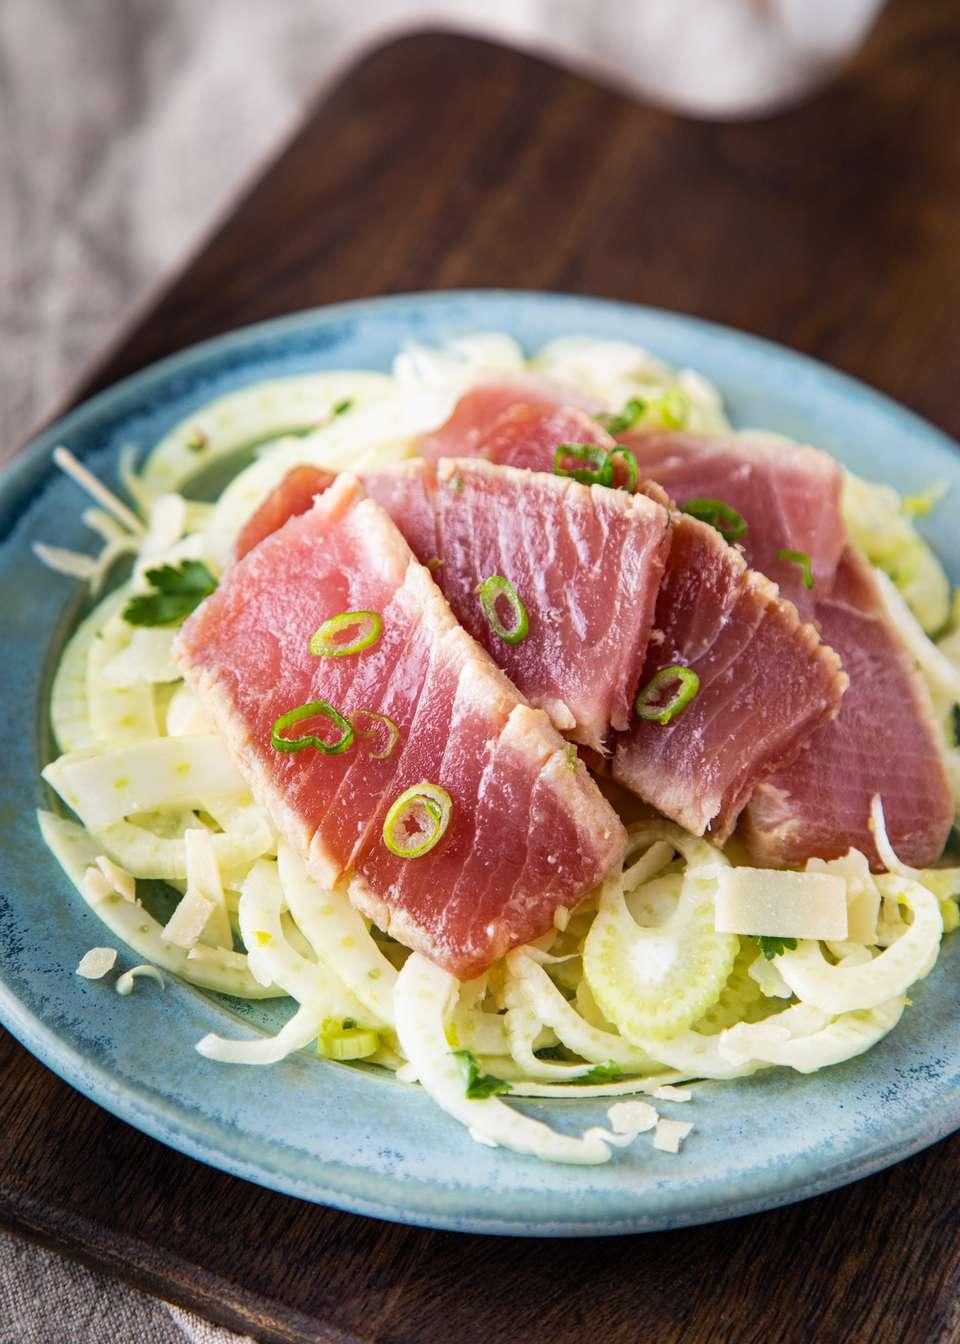 A plate of ahi tuna served over fennel salad.